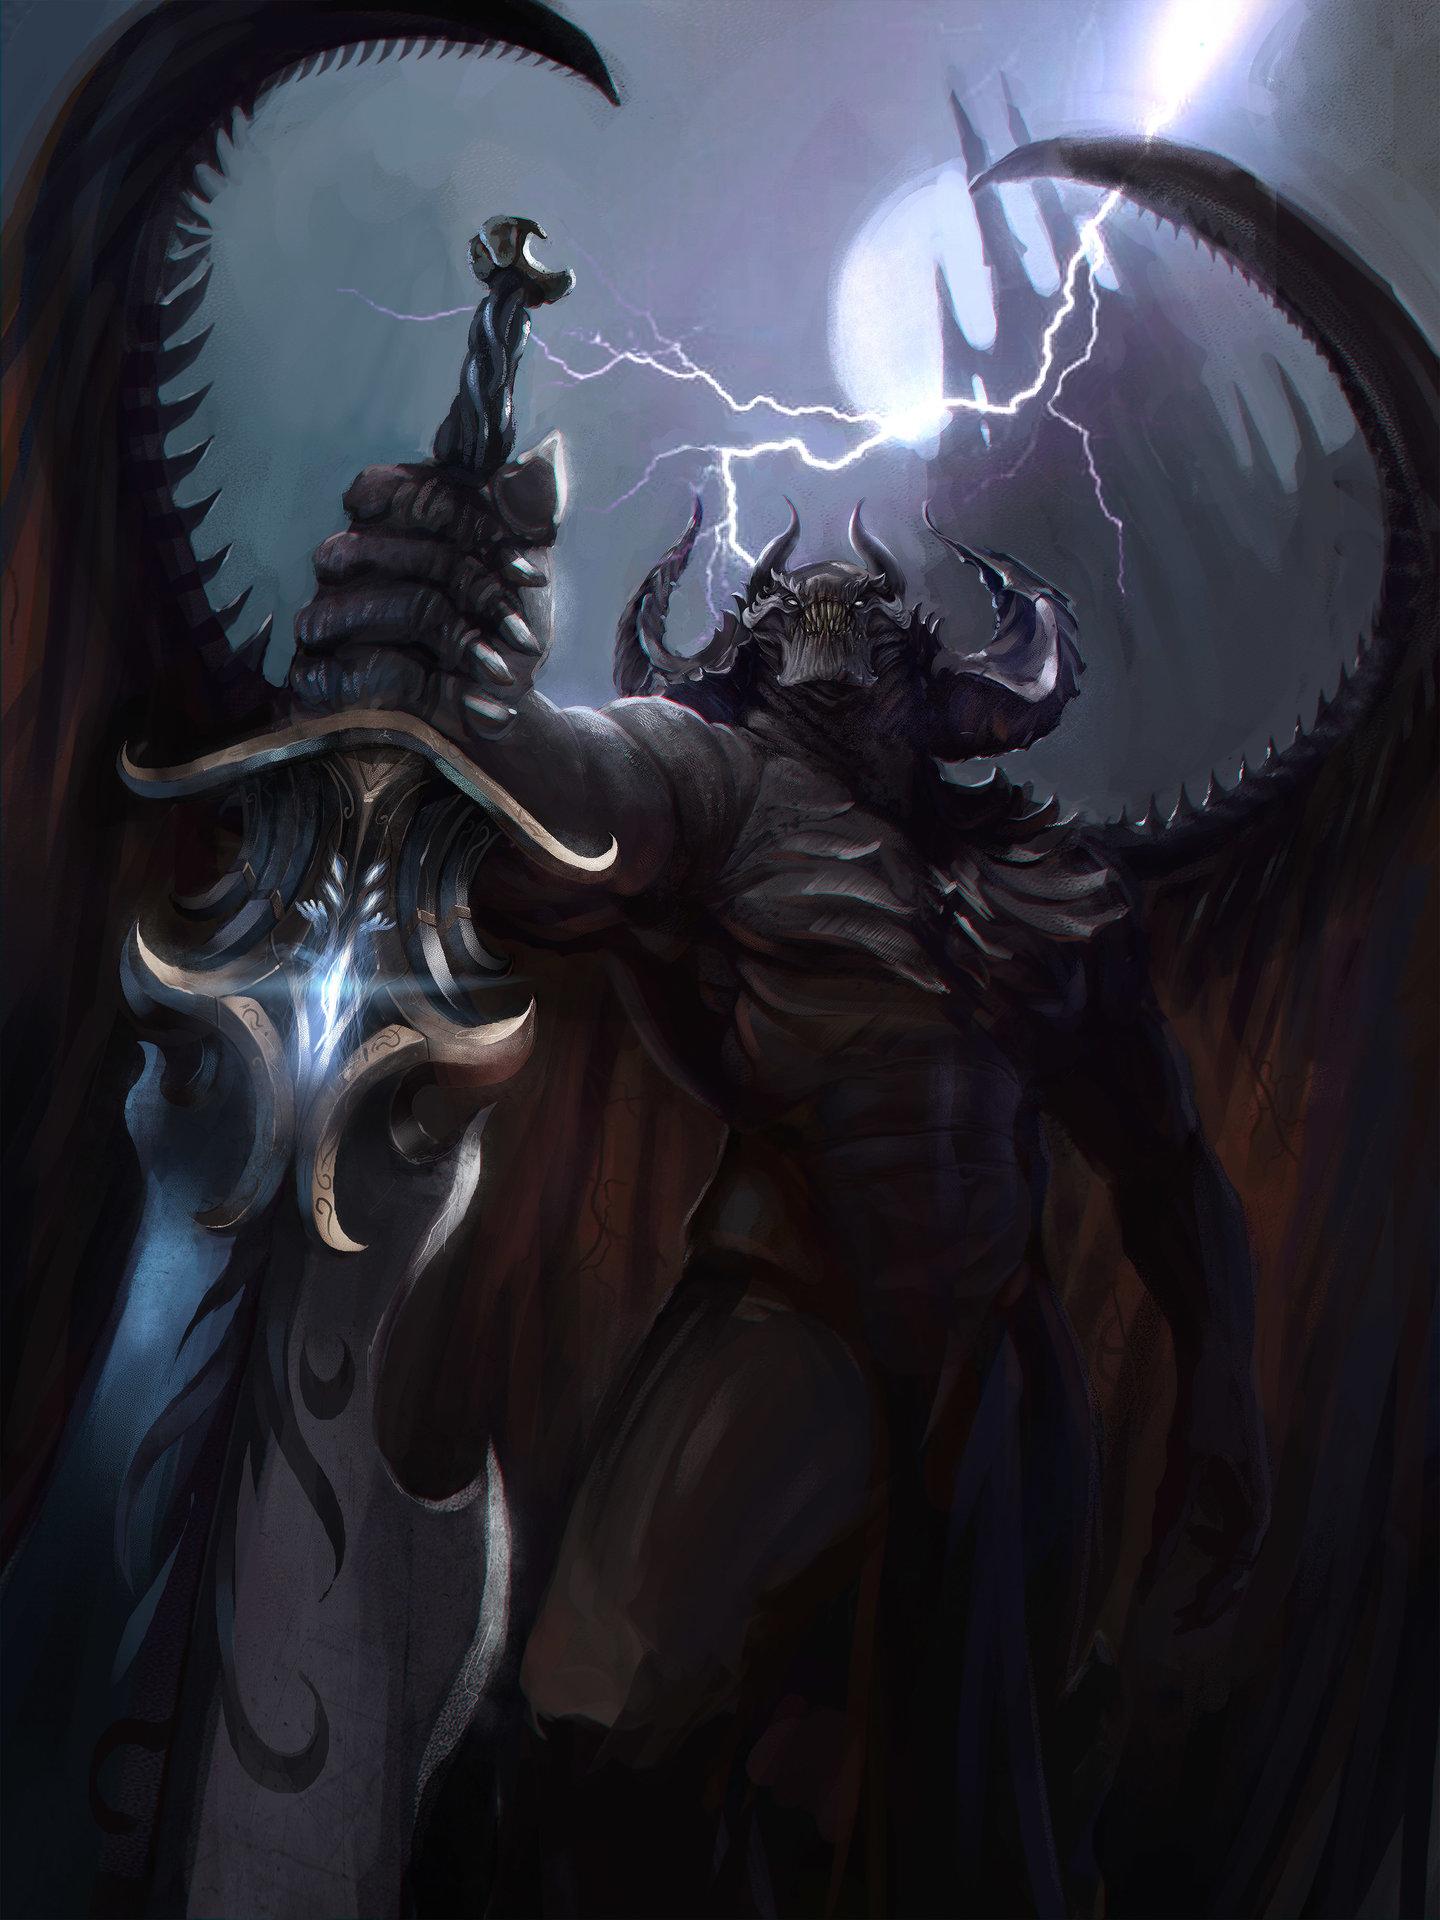 Anime Sniper Wallpaper Artstation King Of Demons Vincent Gradt